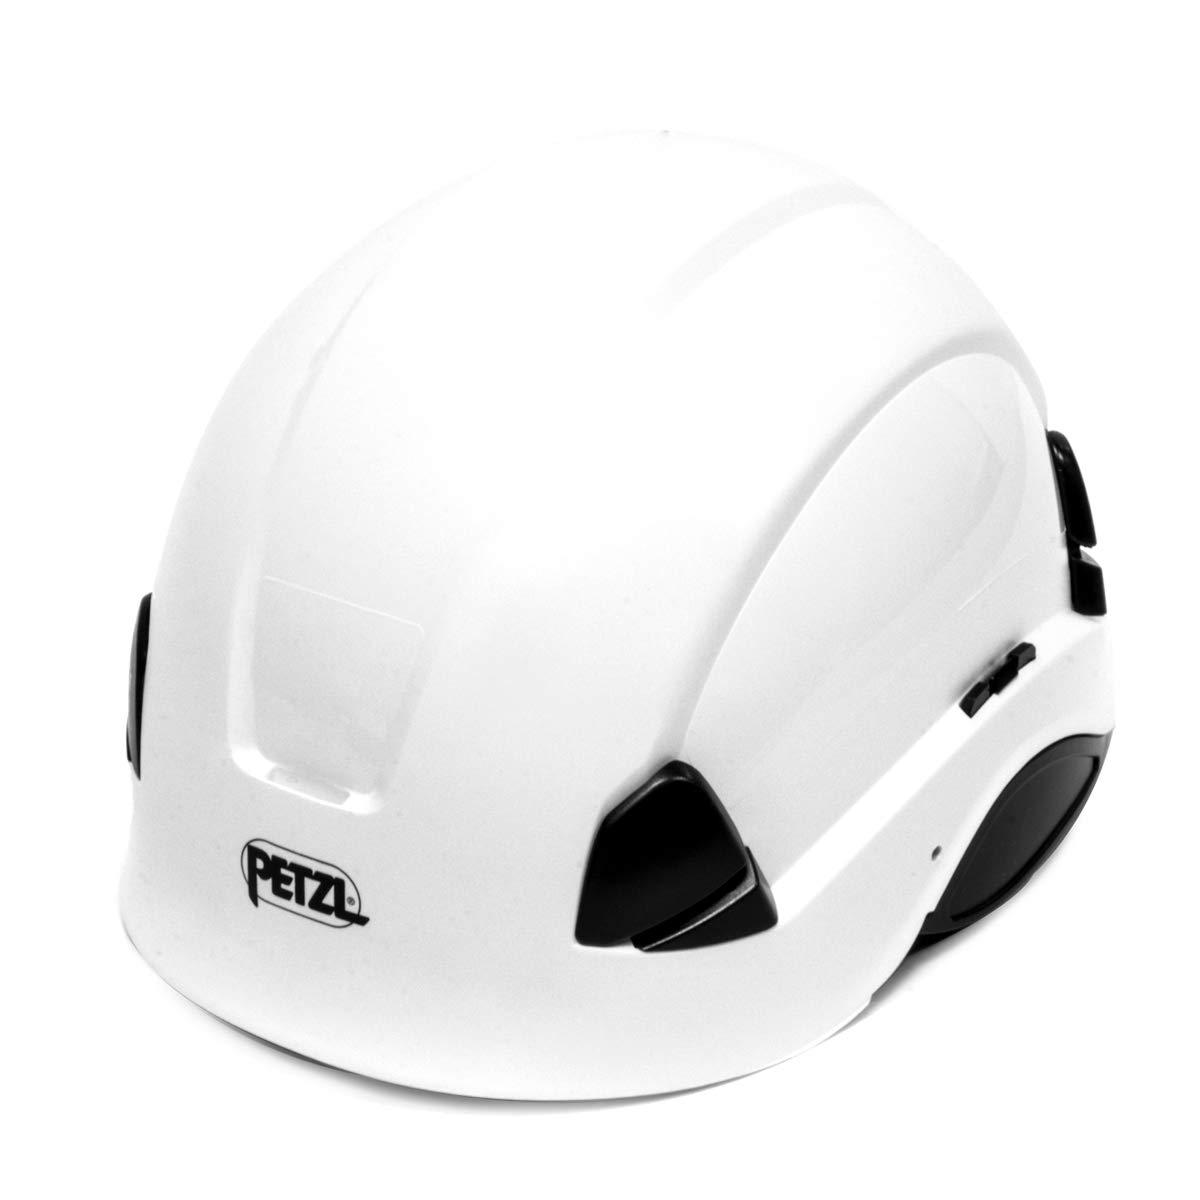 Petzl White Vertex Best Professional Arborist Tree Climbing Helmet A10BWC